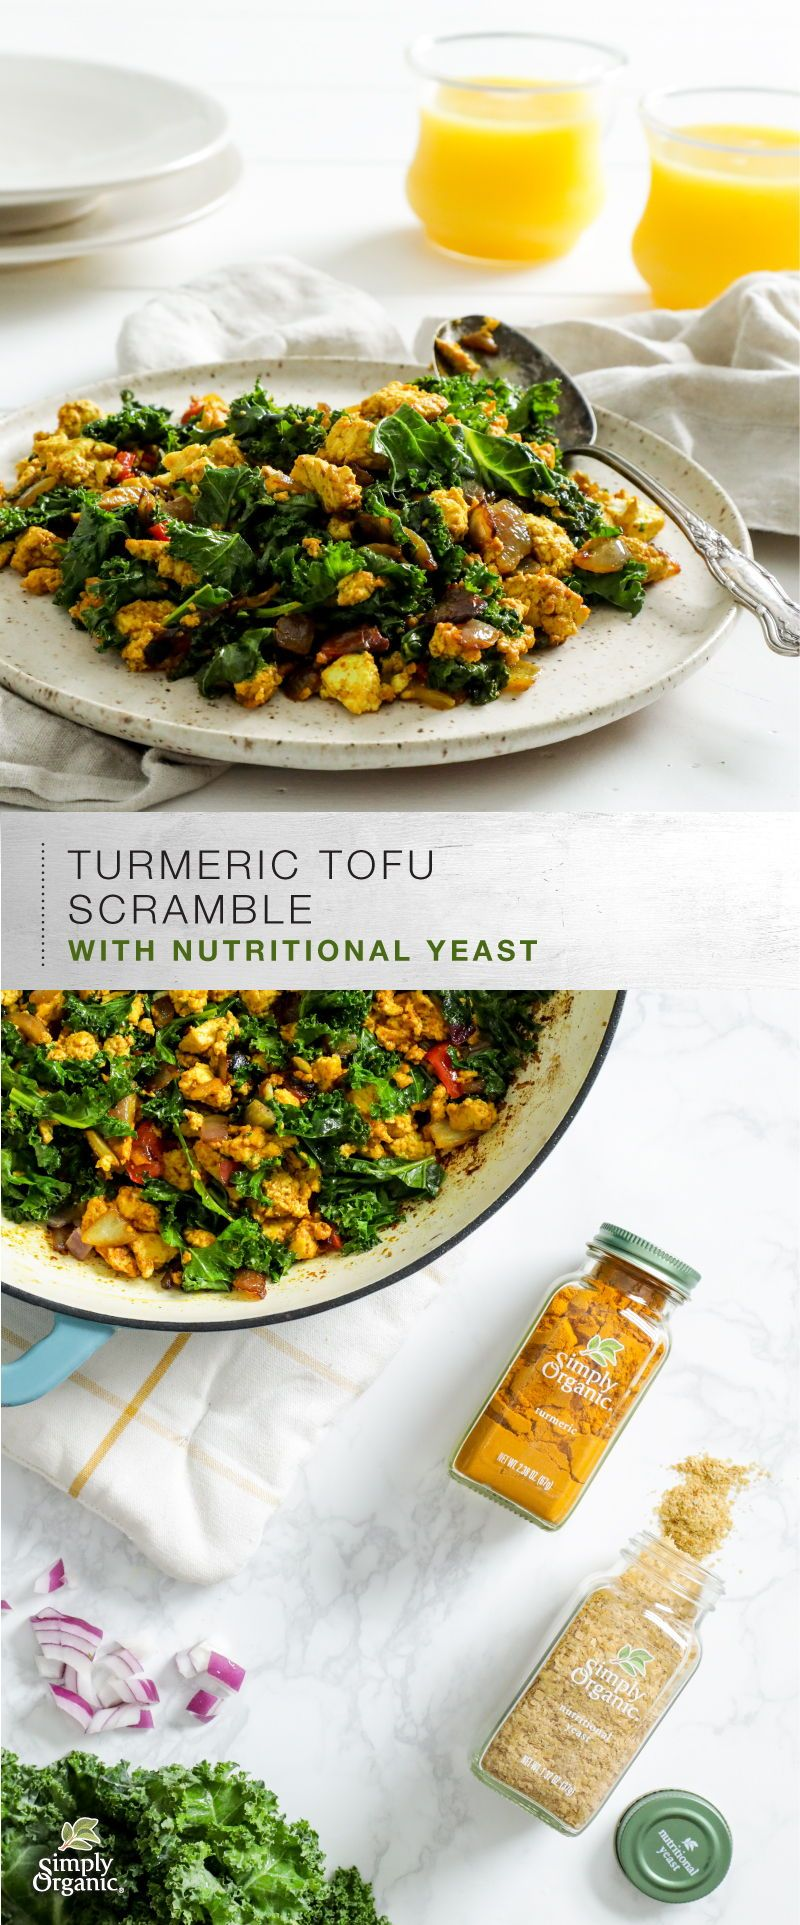 Vegan Turmeric Tofu Scramble With Nutritional Yeast